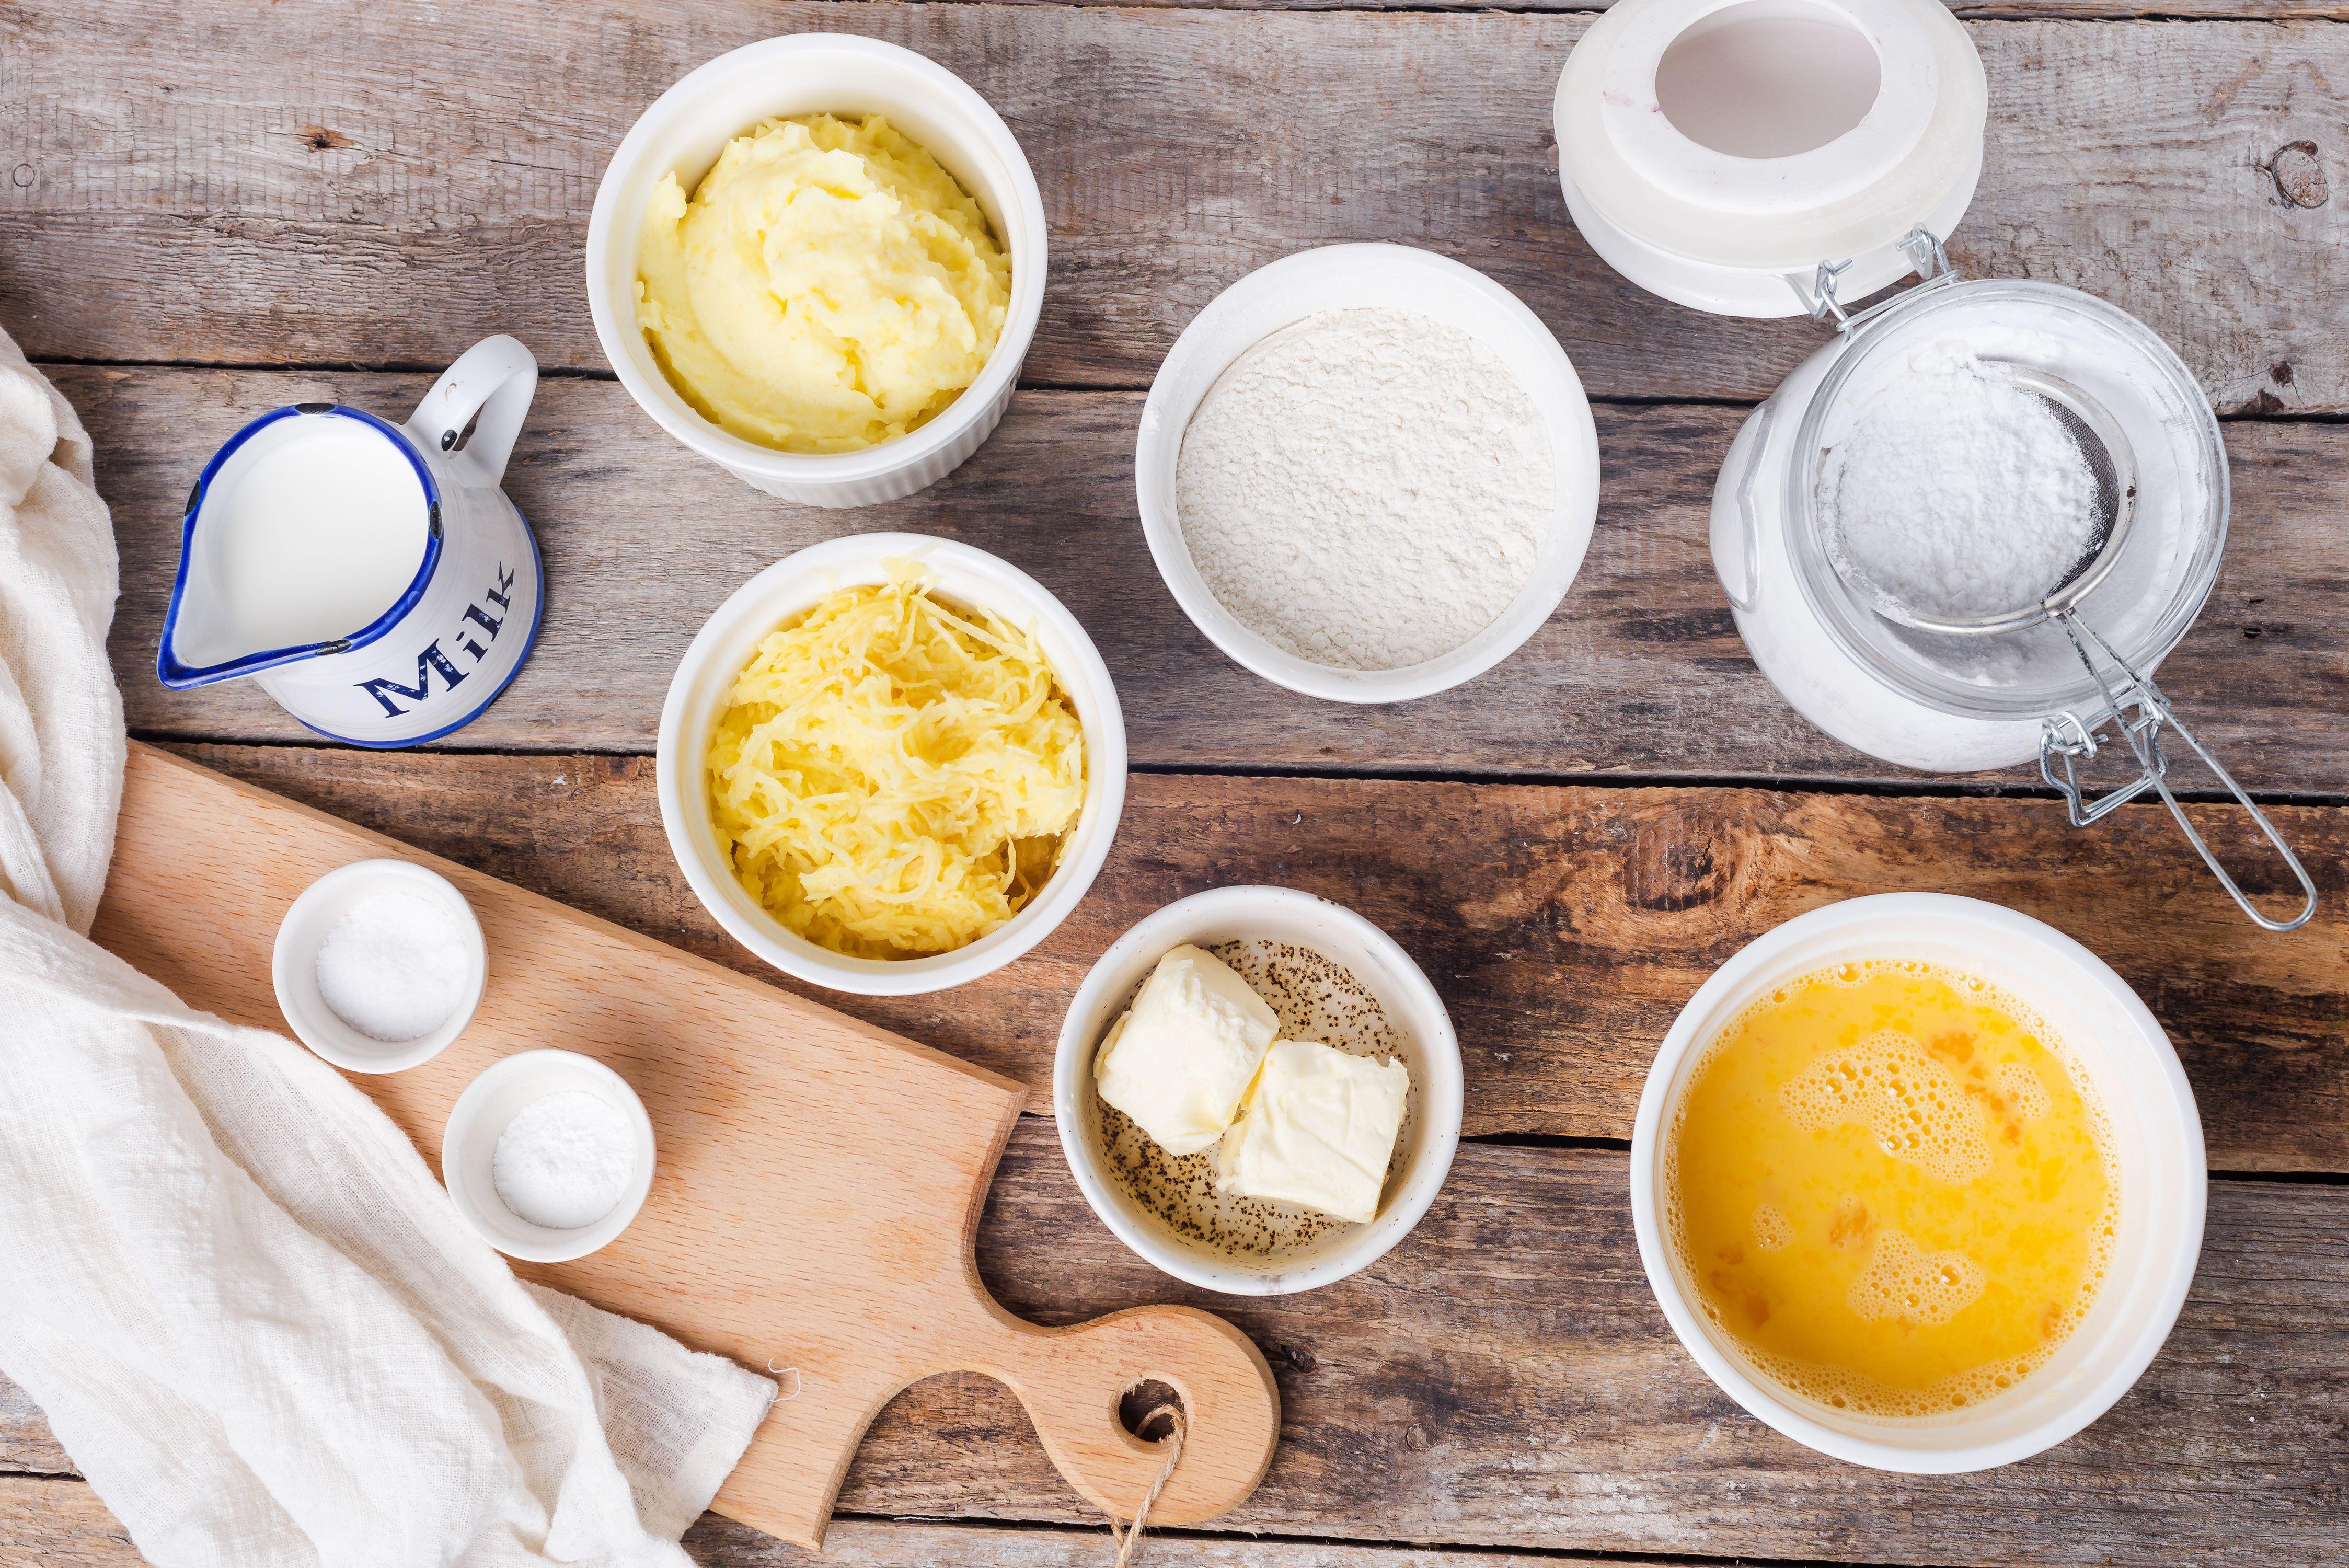 Ingredients for Irish potato cakes